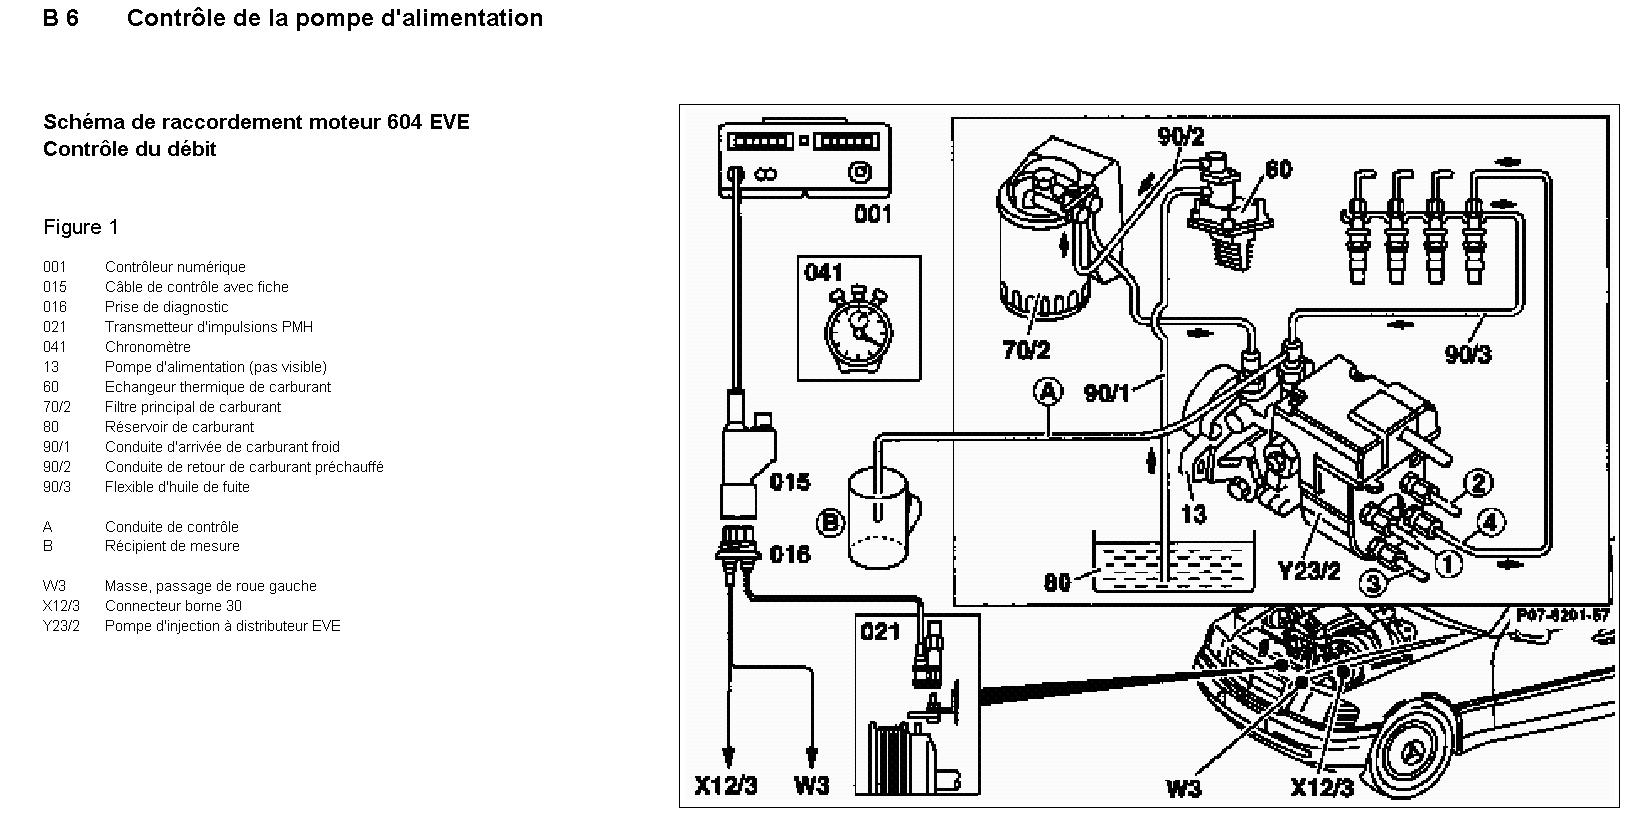 schema moteur opel zafira 1.9 cdti